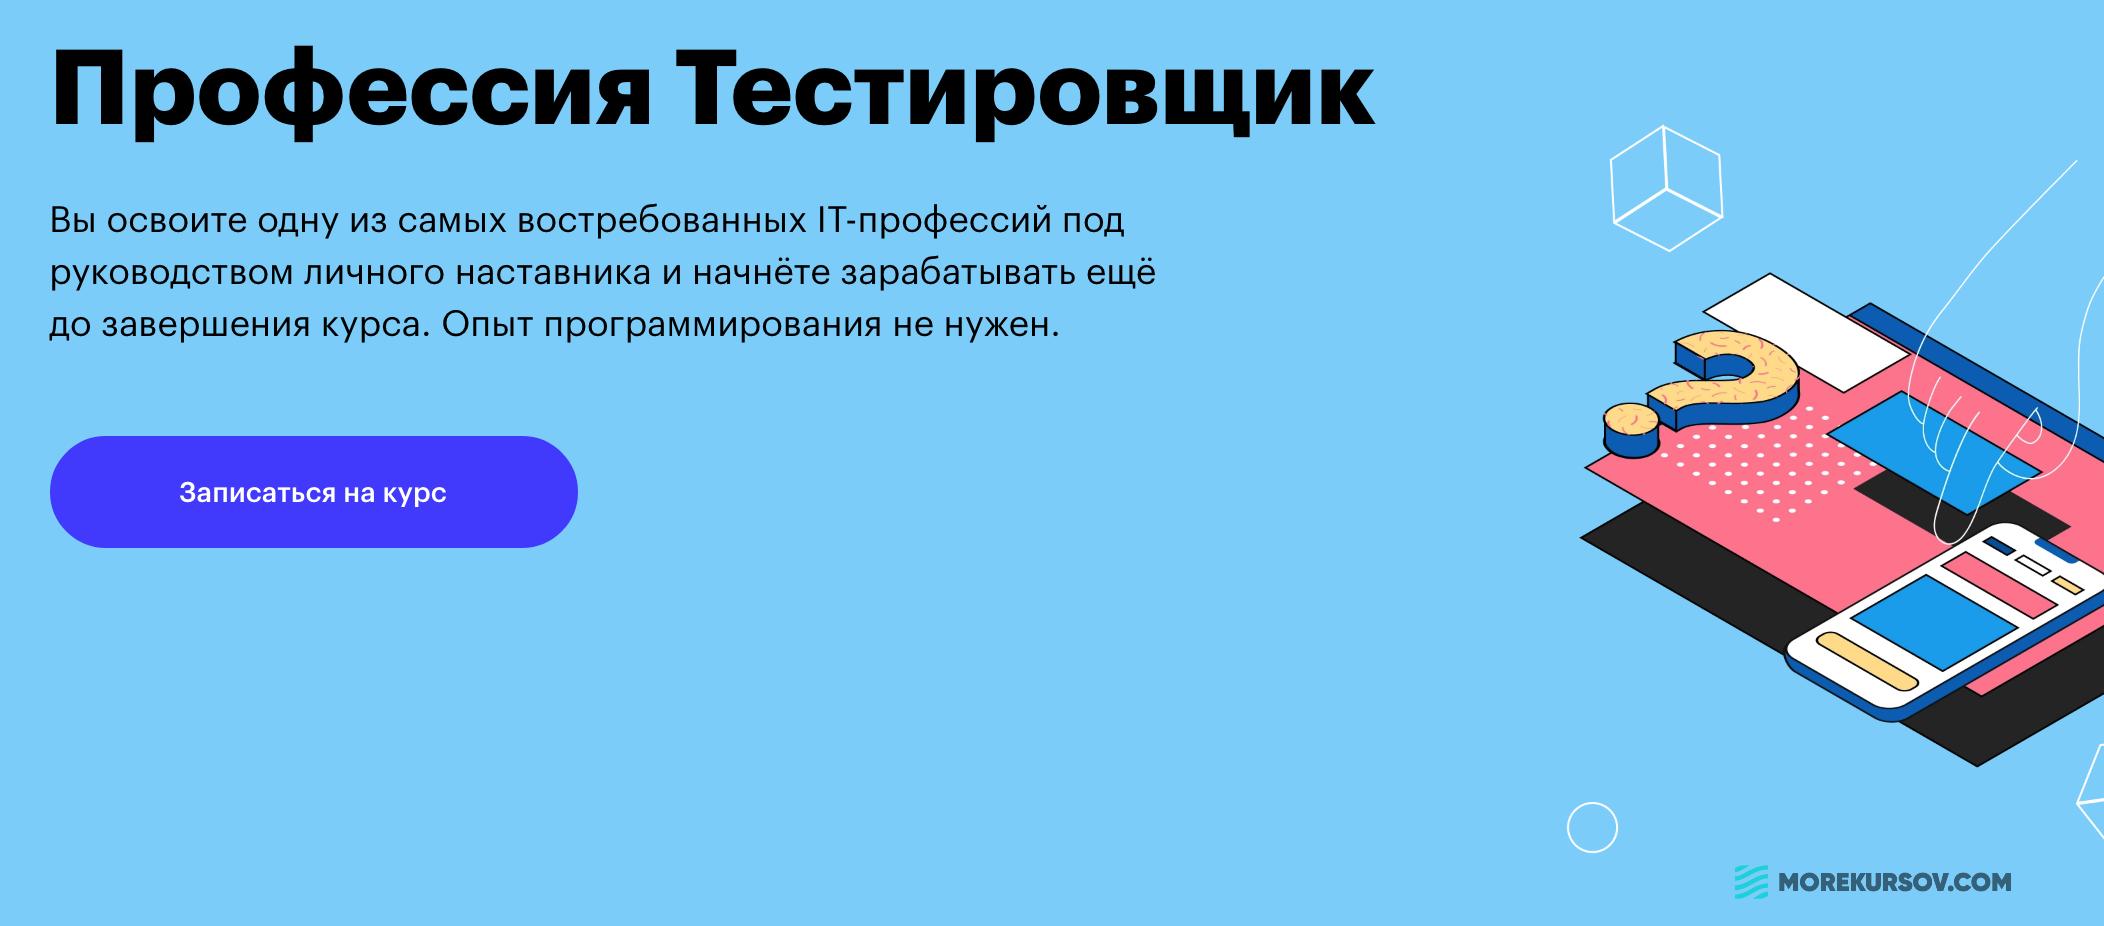 snimok-ehkrana-2020-09-13-v-10-18-17-png.9611